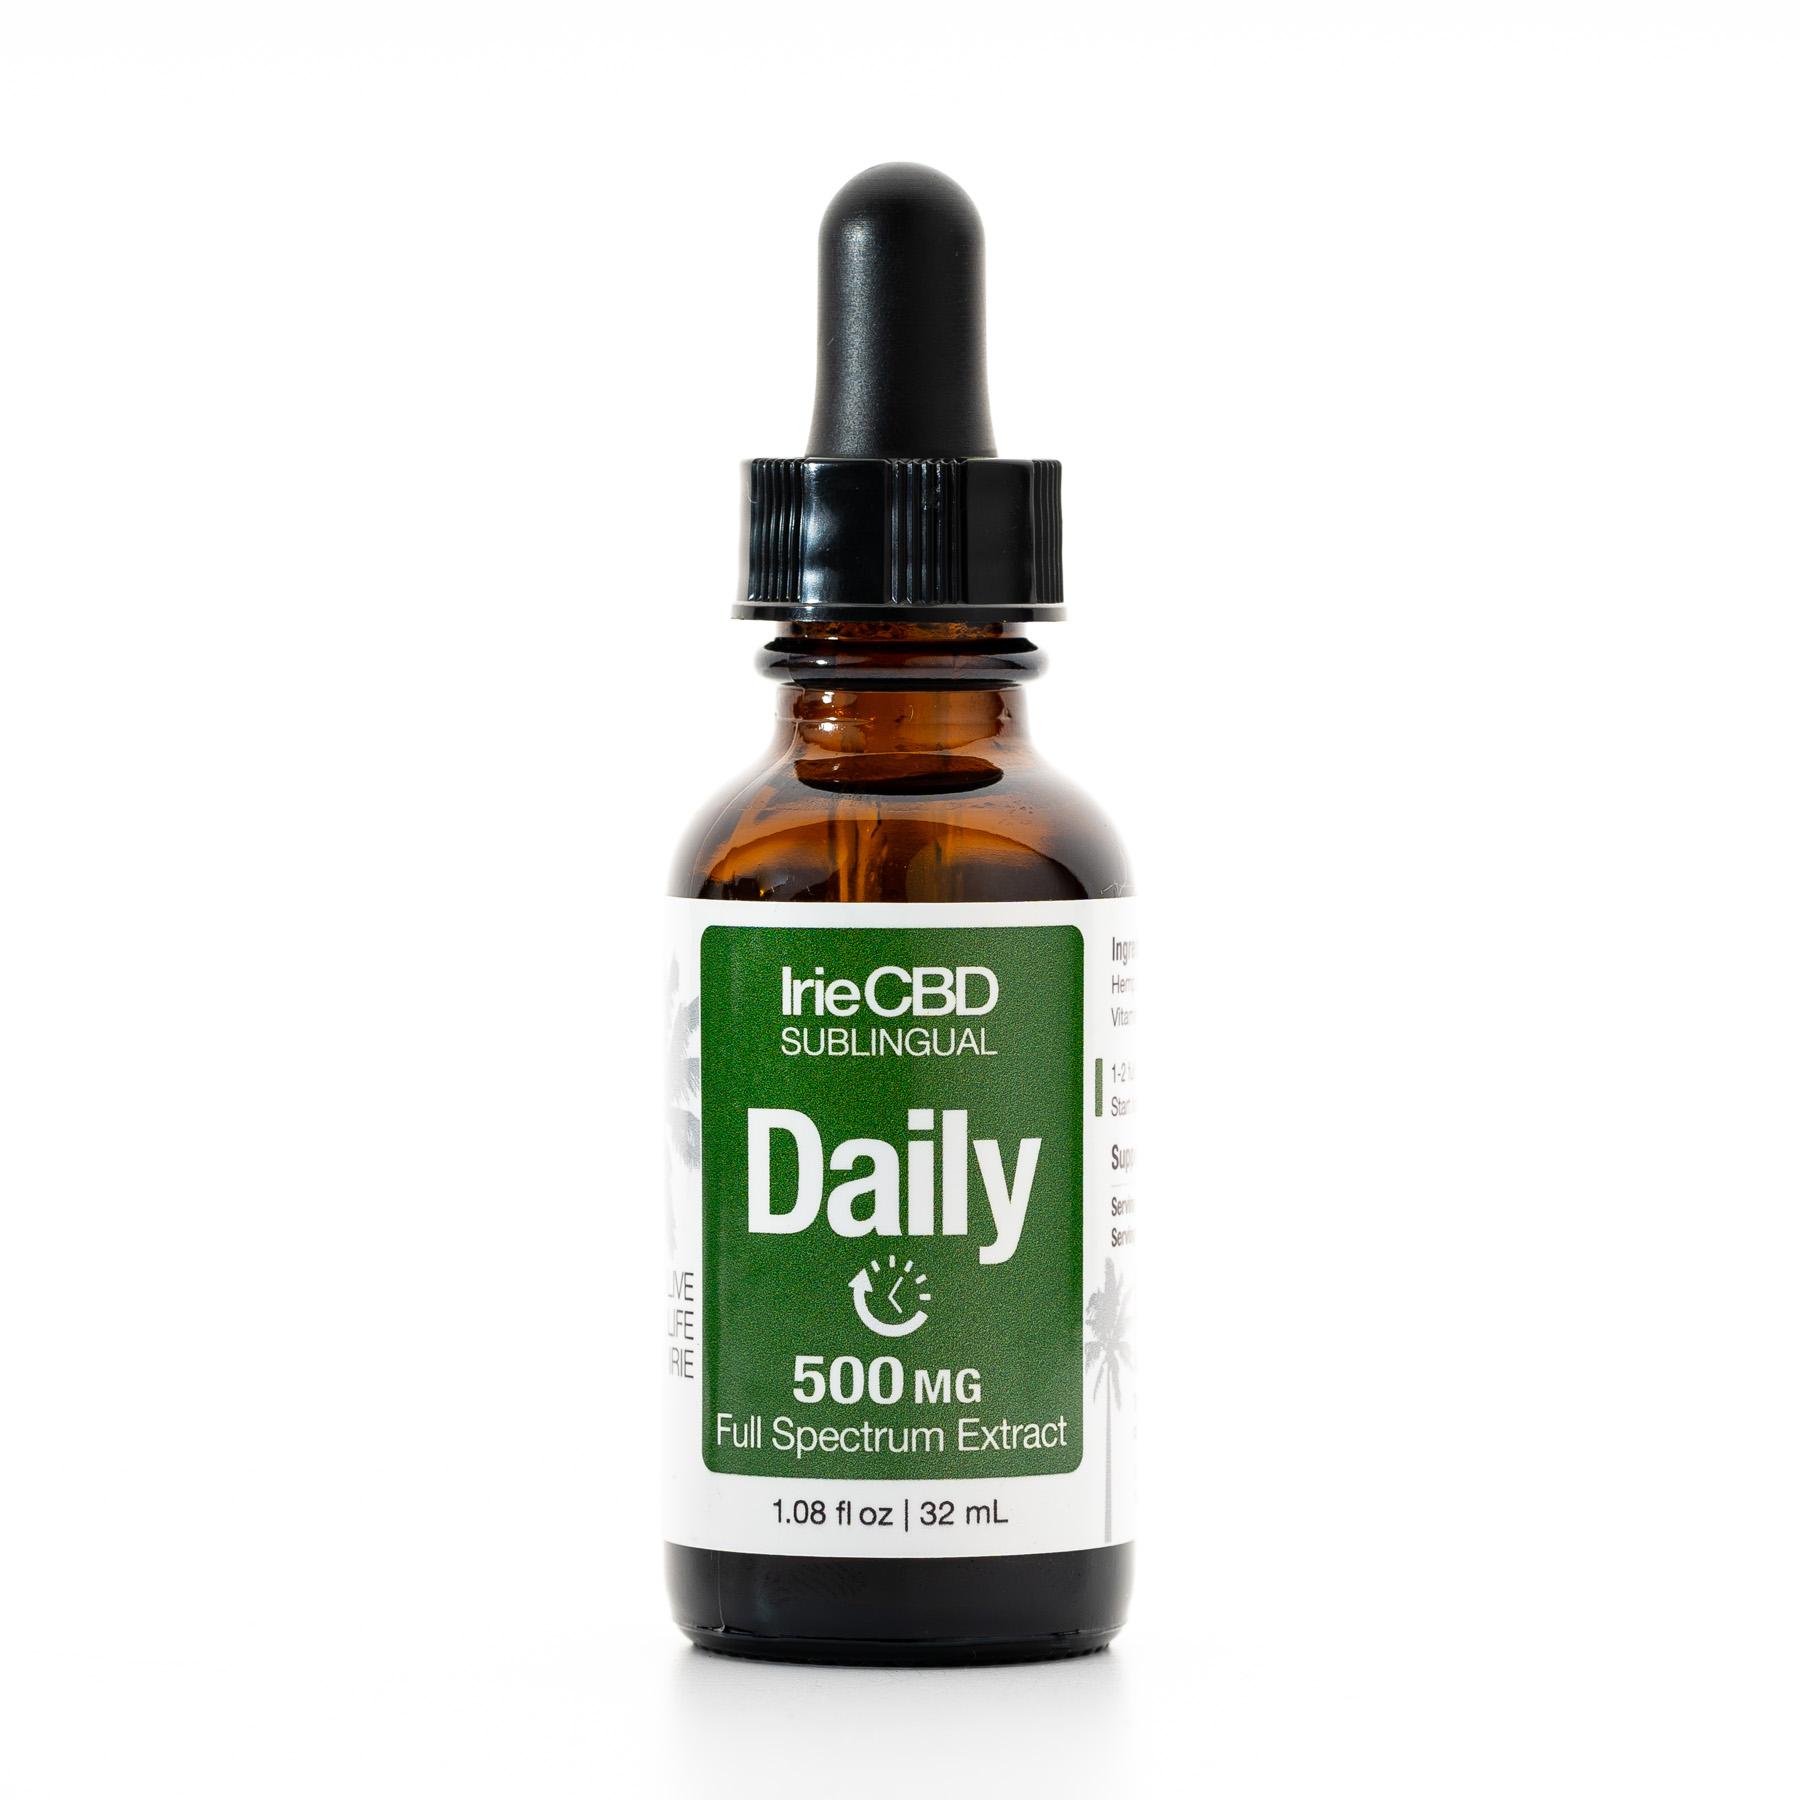 Daily 500mg CBD Oil Tincture Irie CBD